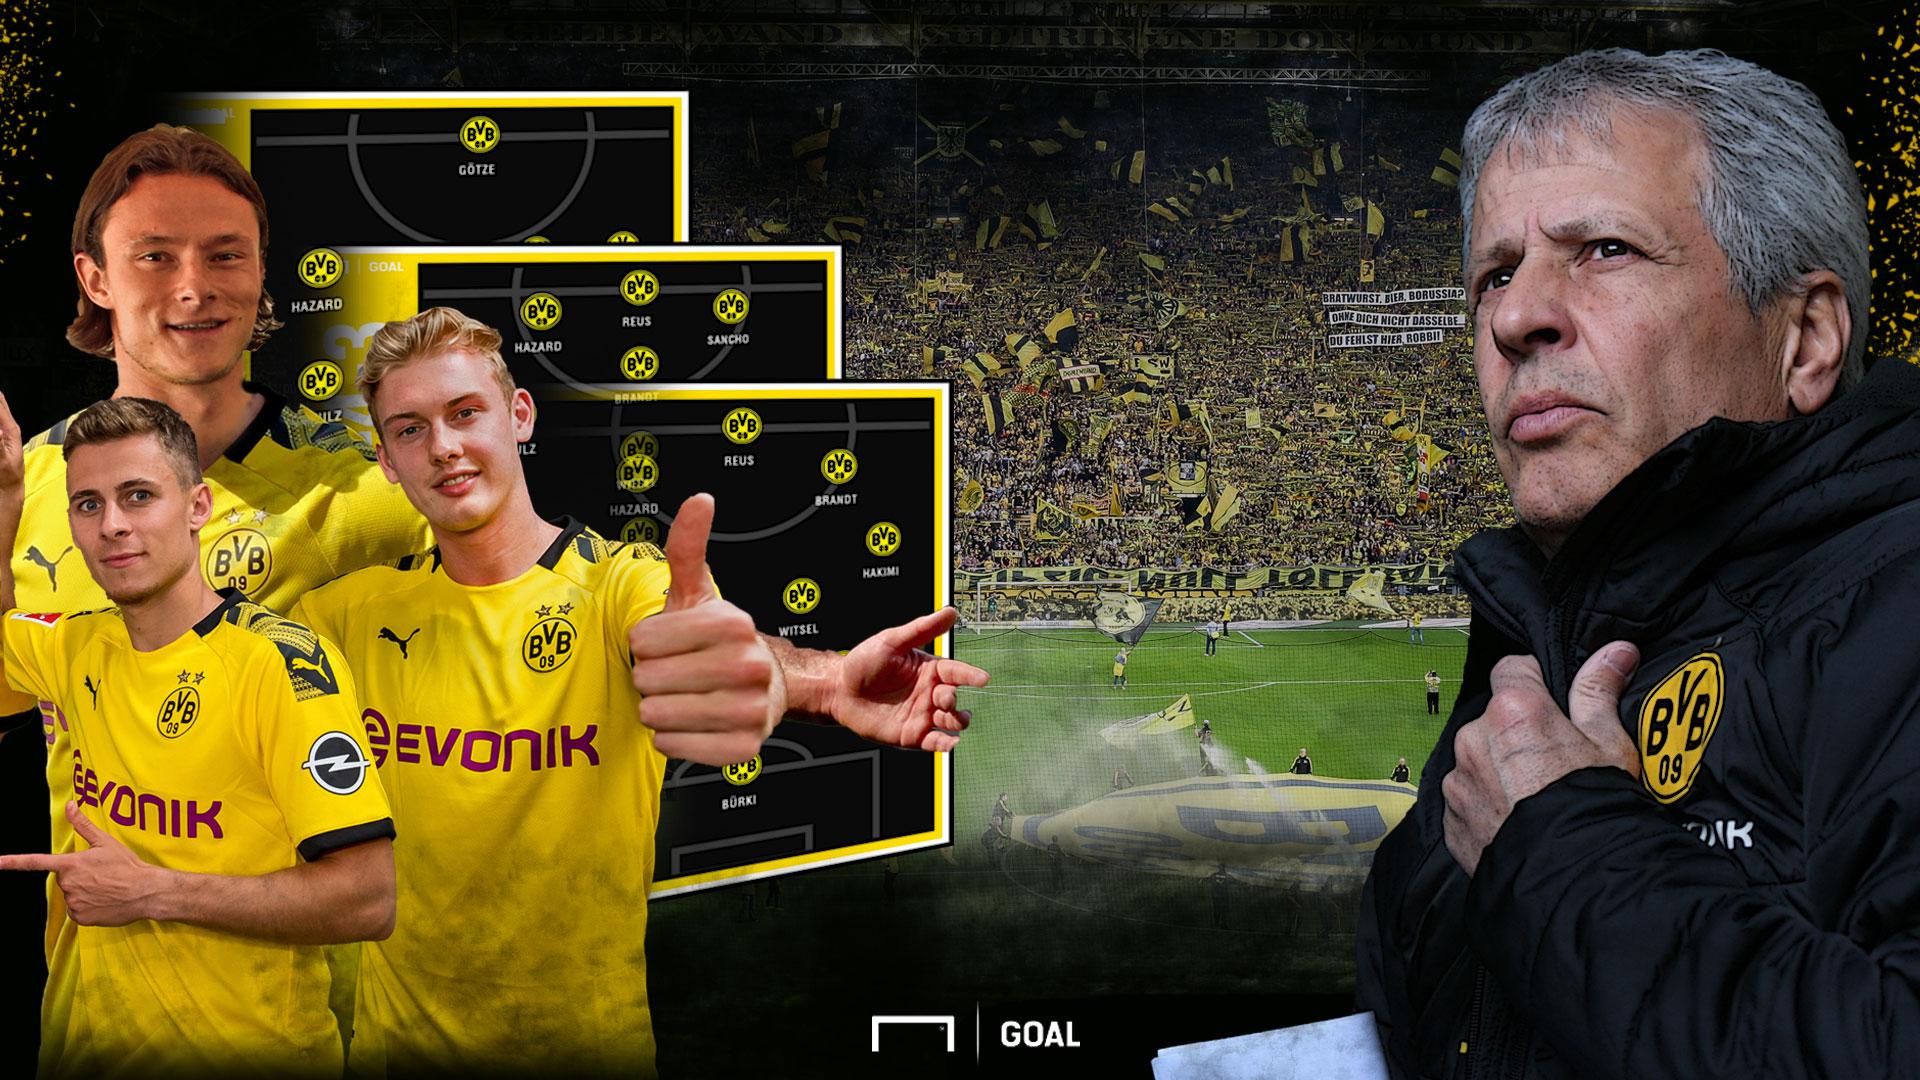 GFX BVB Julian Brandt Nico Schulz Thorgan Hazard Julien Brandt